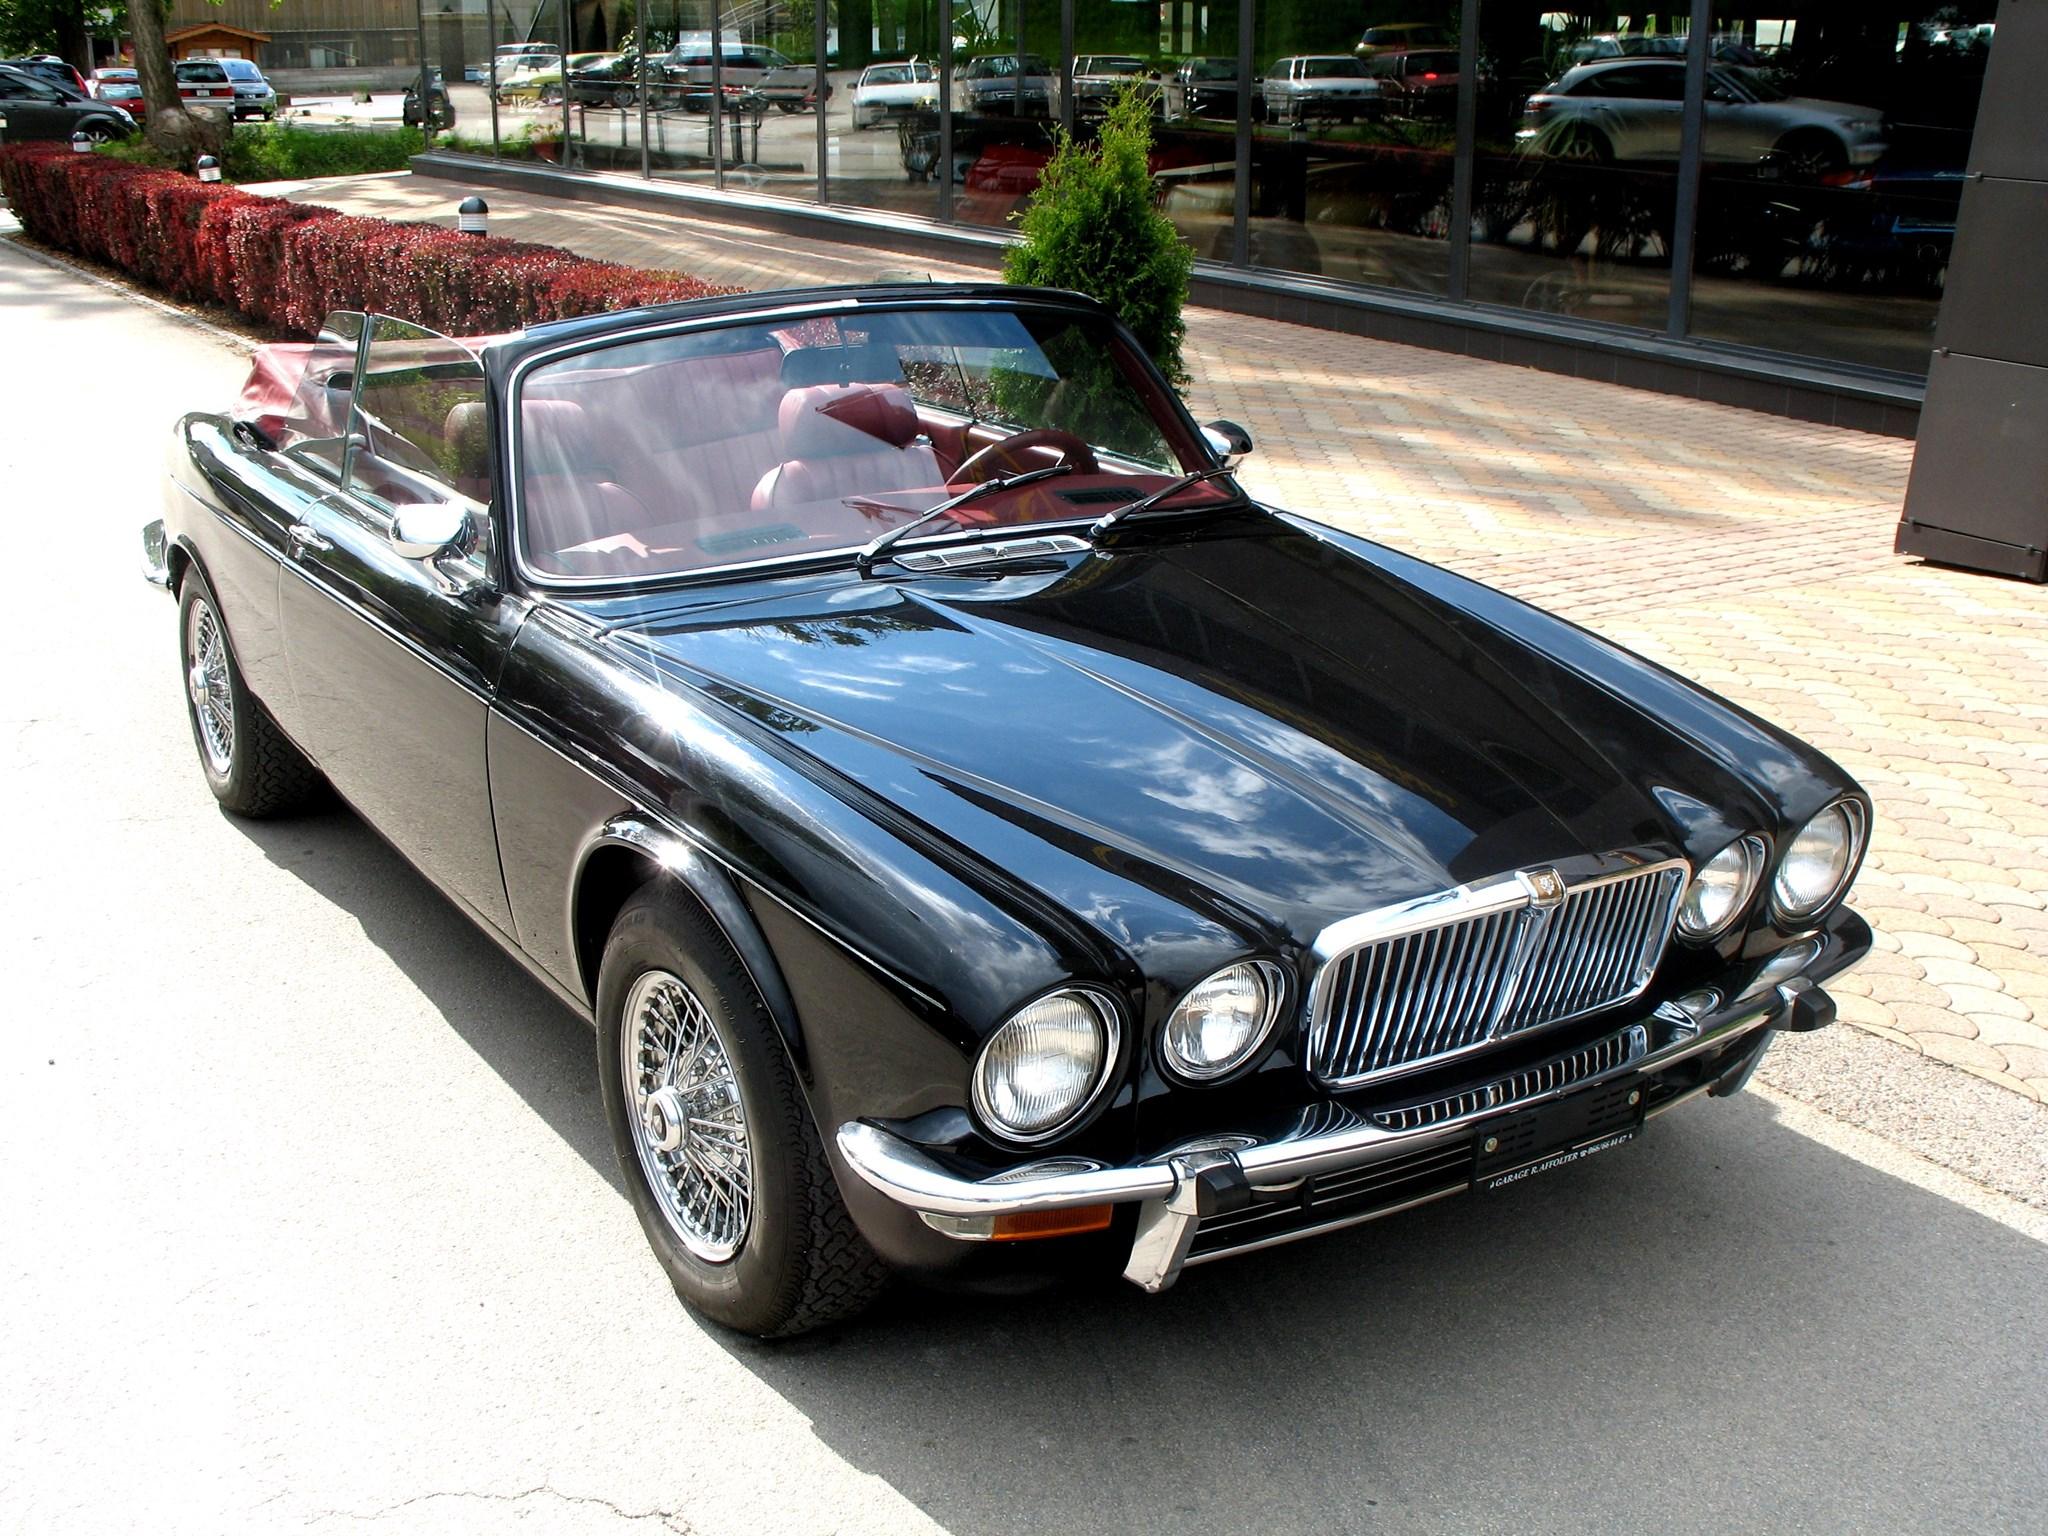 cabriolet Jaguar XJ C 12